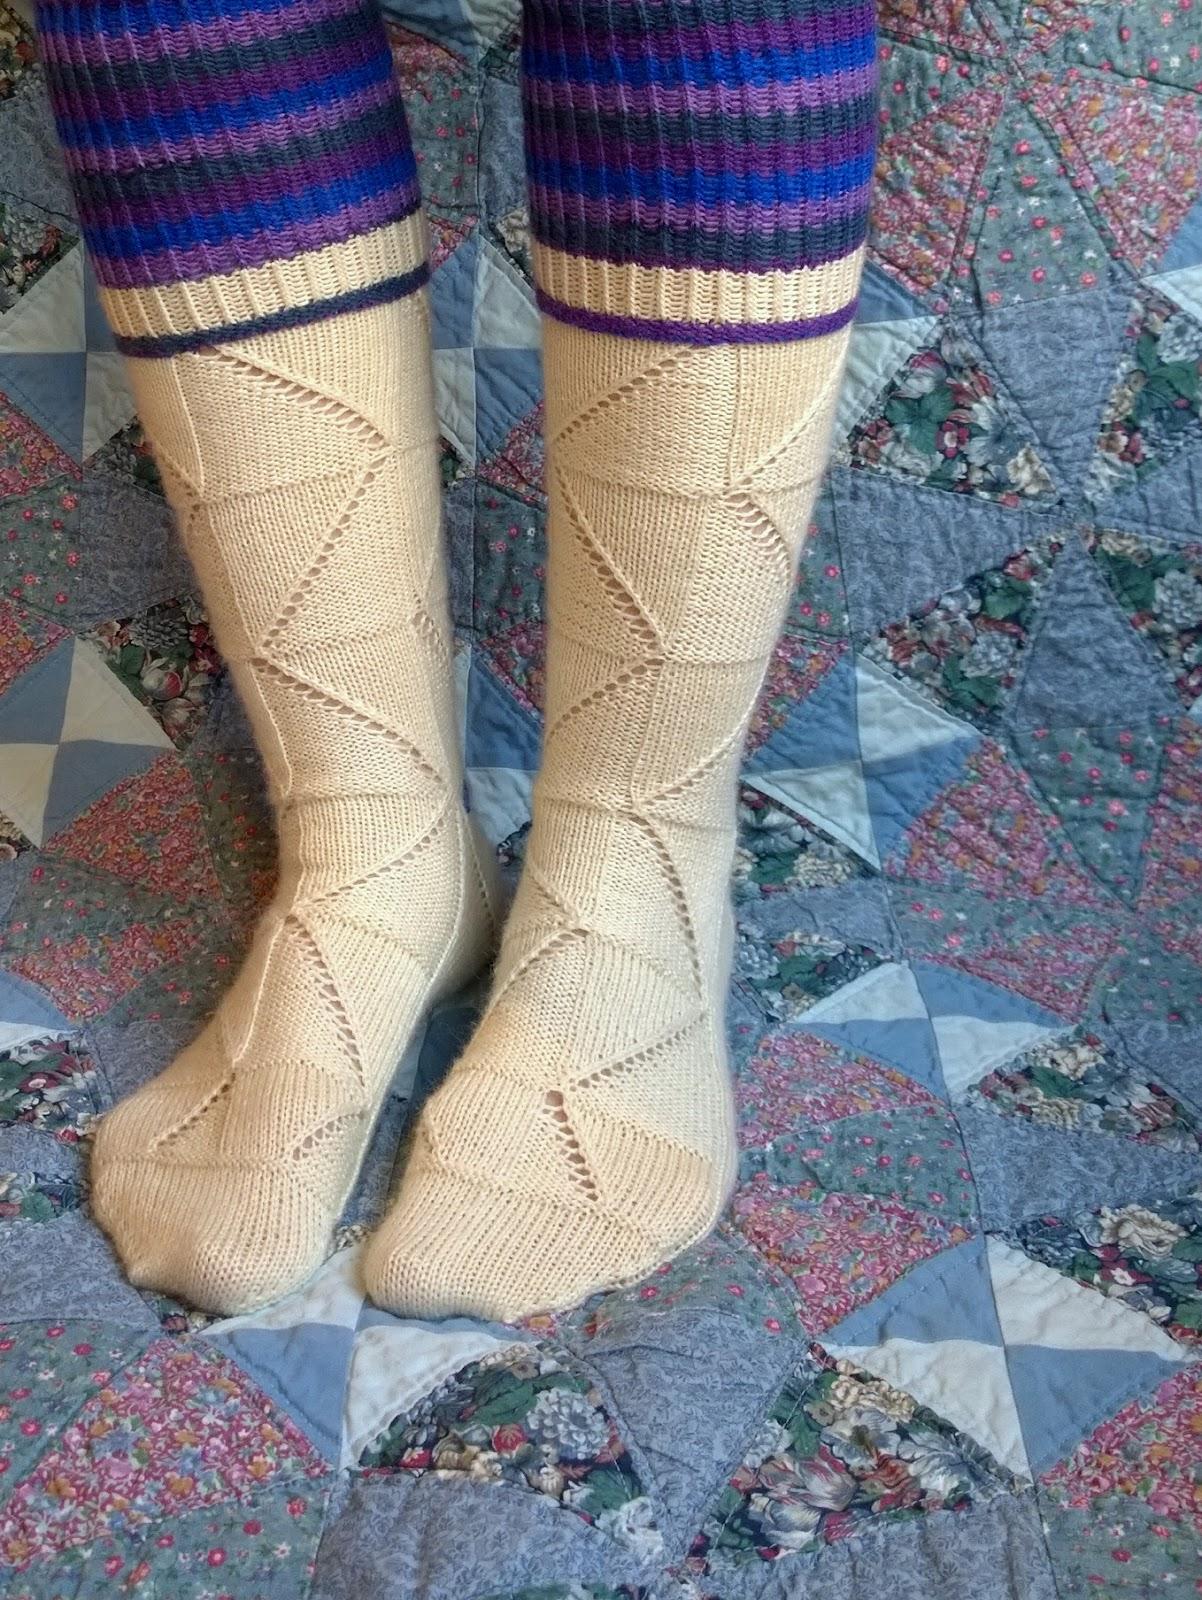 D a n c e s W i t h W o o l: March socks